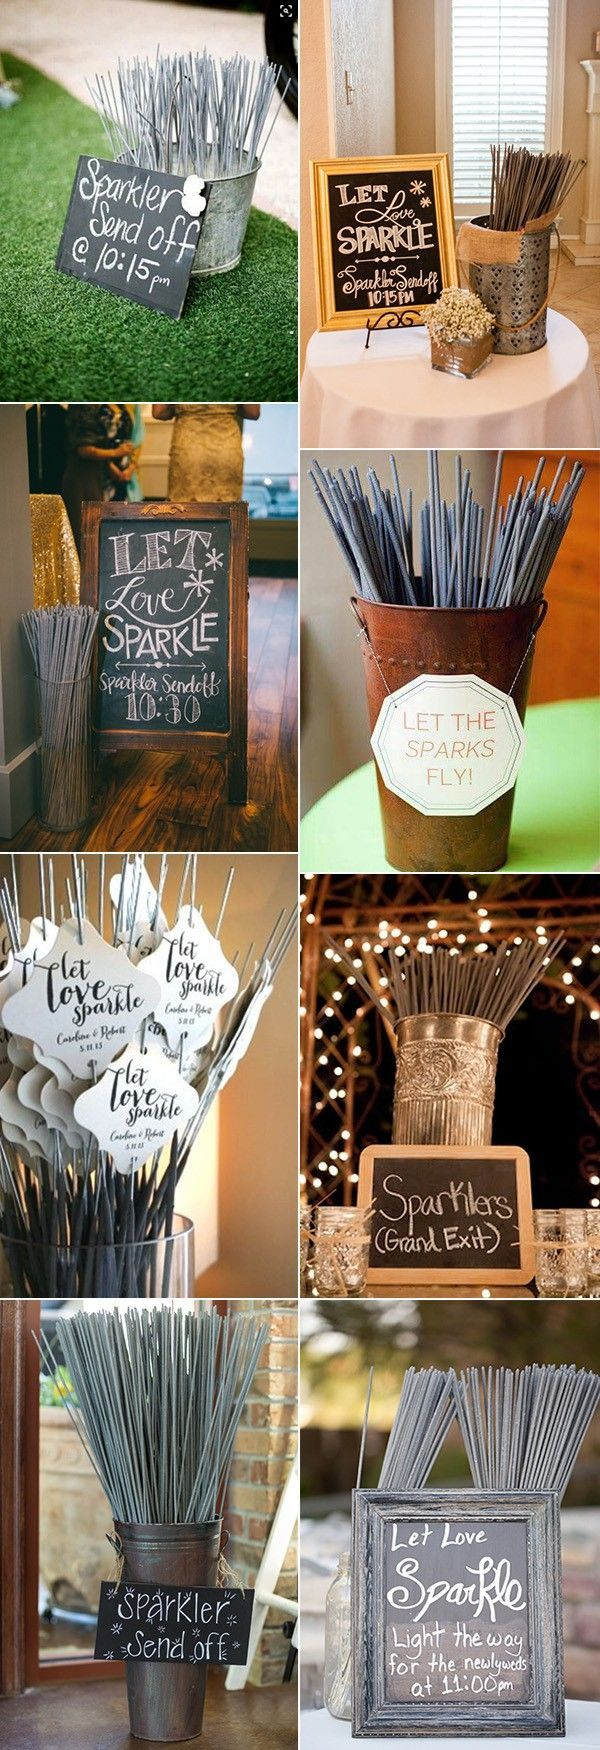 Wedding decorations in nigeria november 2018  best Outdoor weddings images on Pinterest  Wedding ideas Wedding